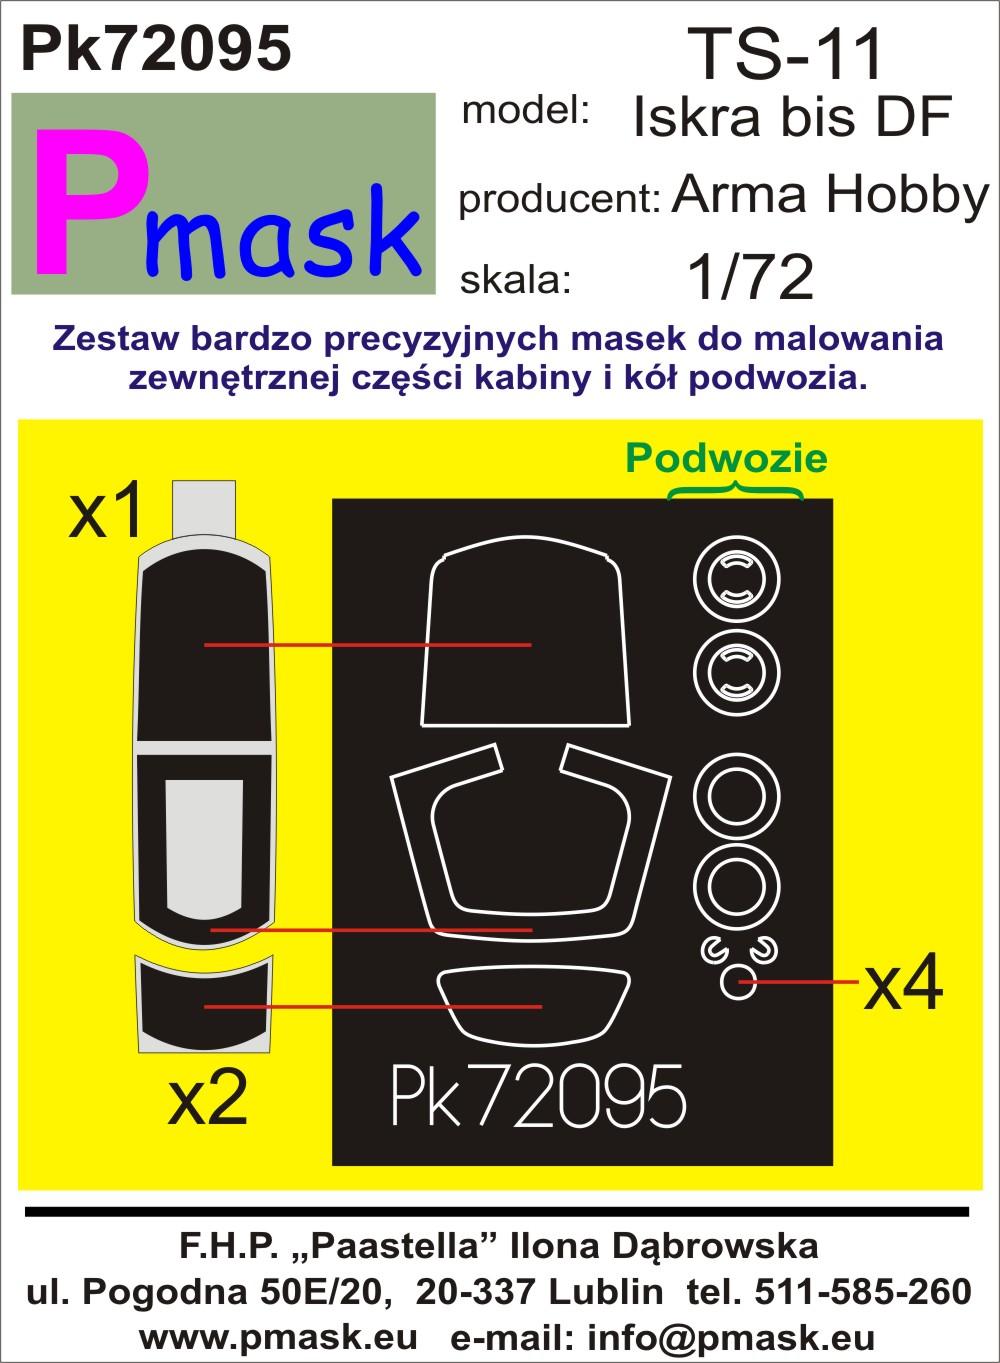 PK72095